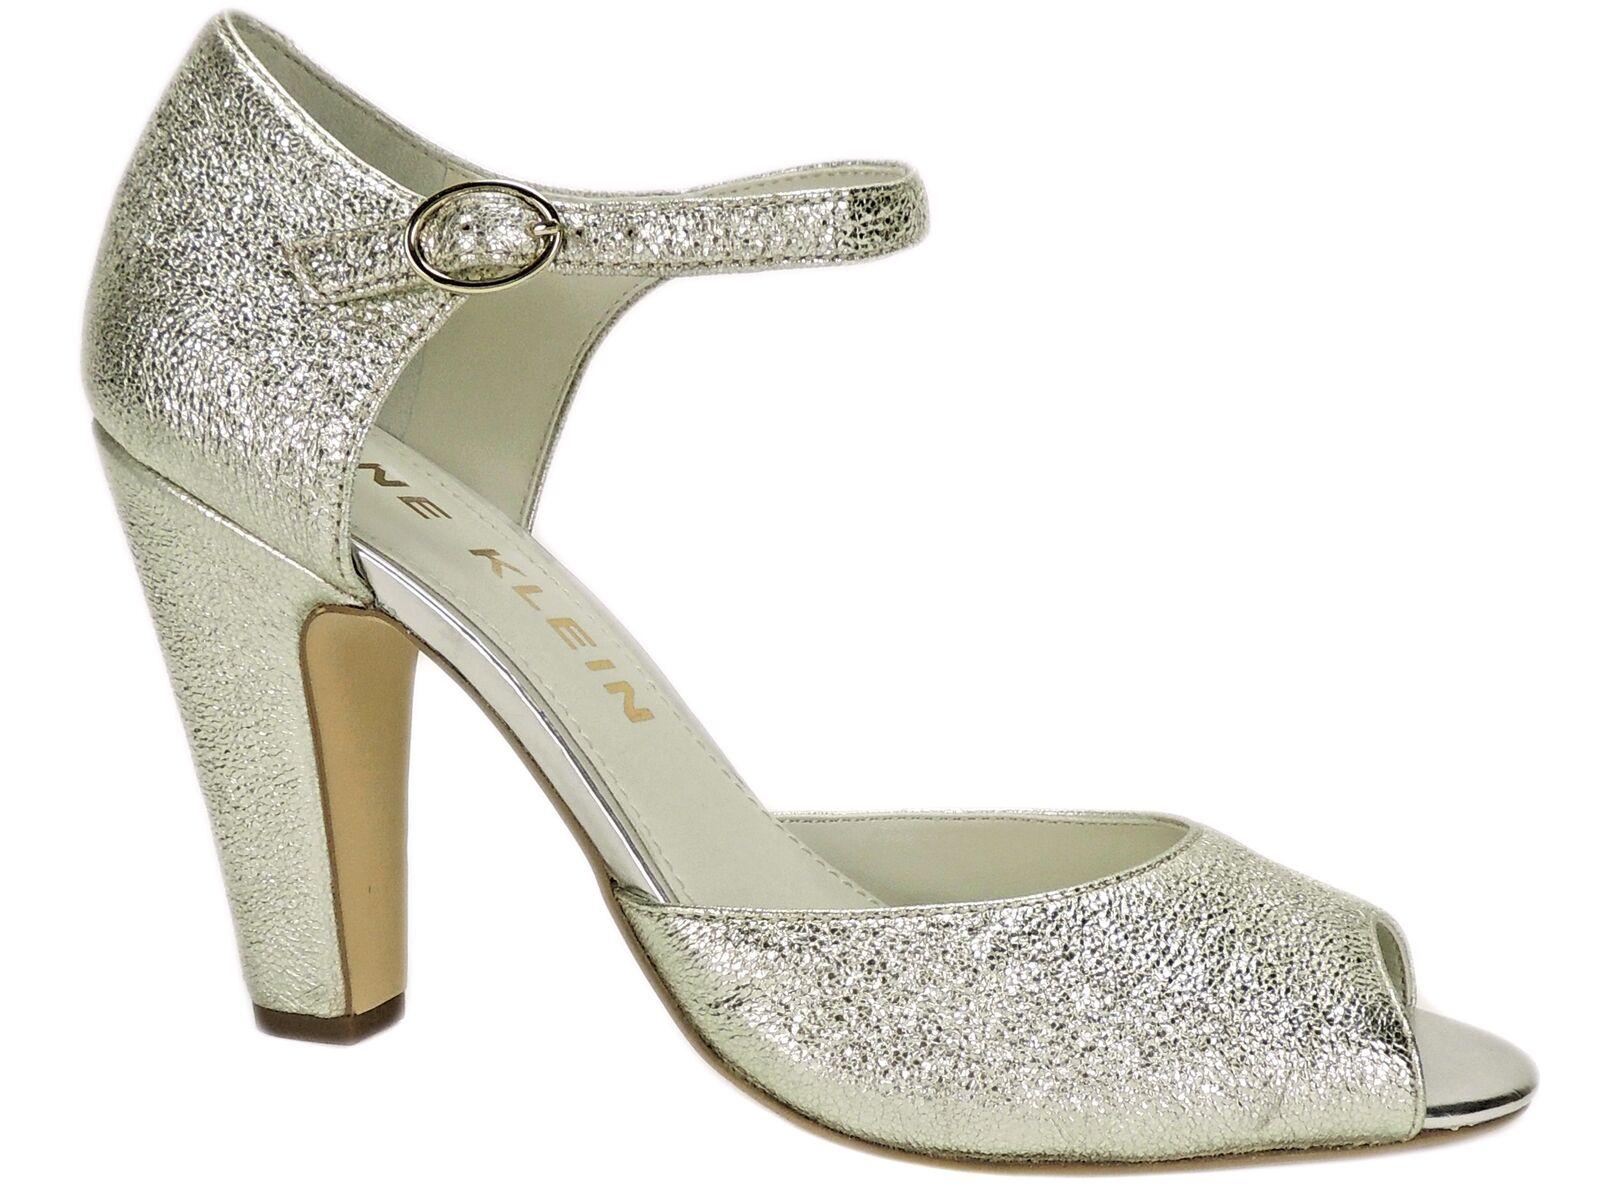 Anne Klein Women's Henrika Peep-Toe Pumps Light Gold Size 10 M